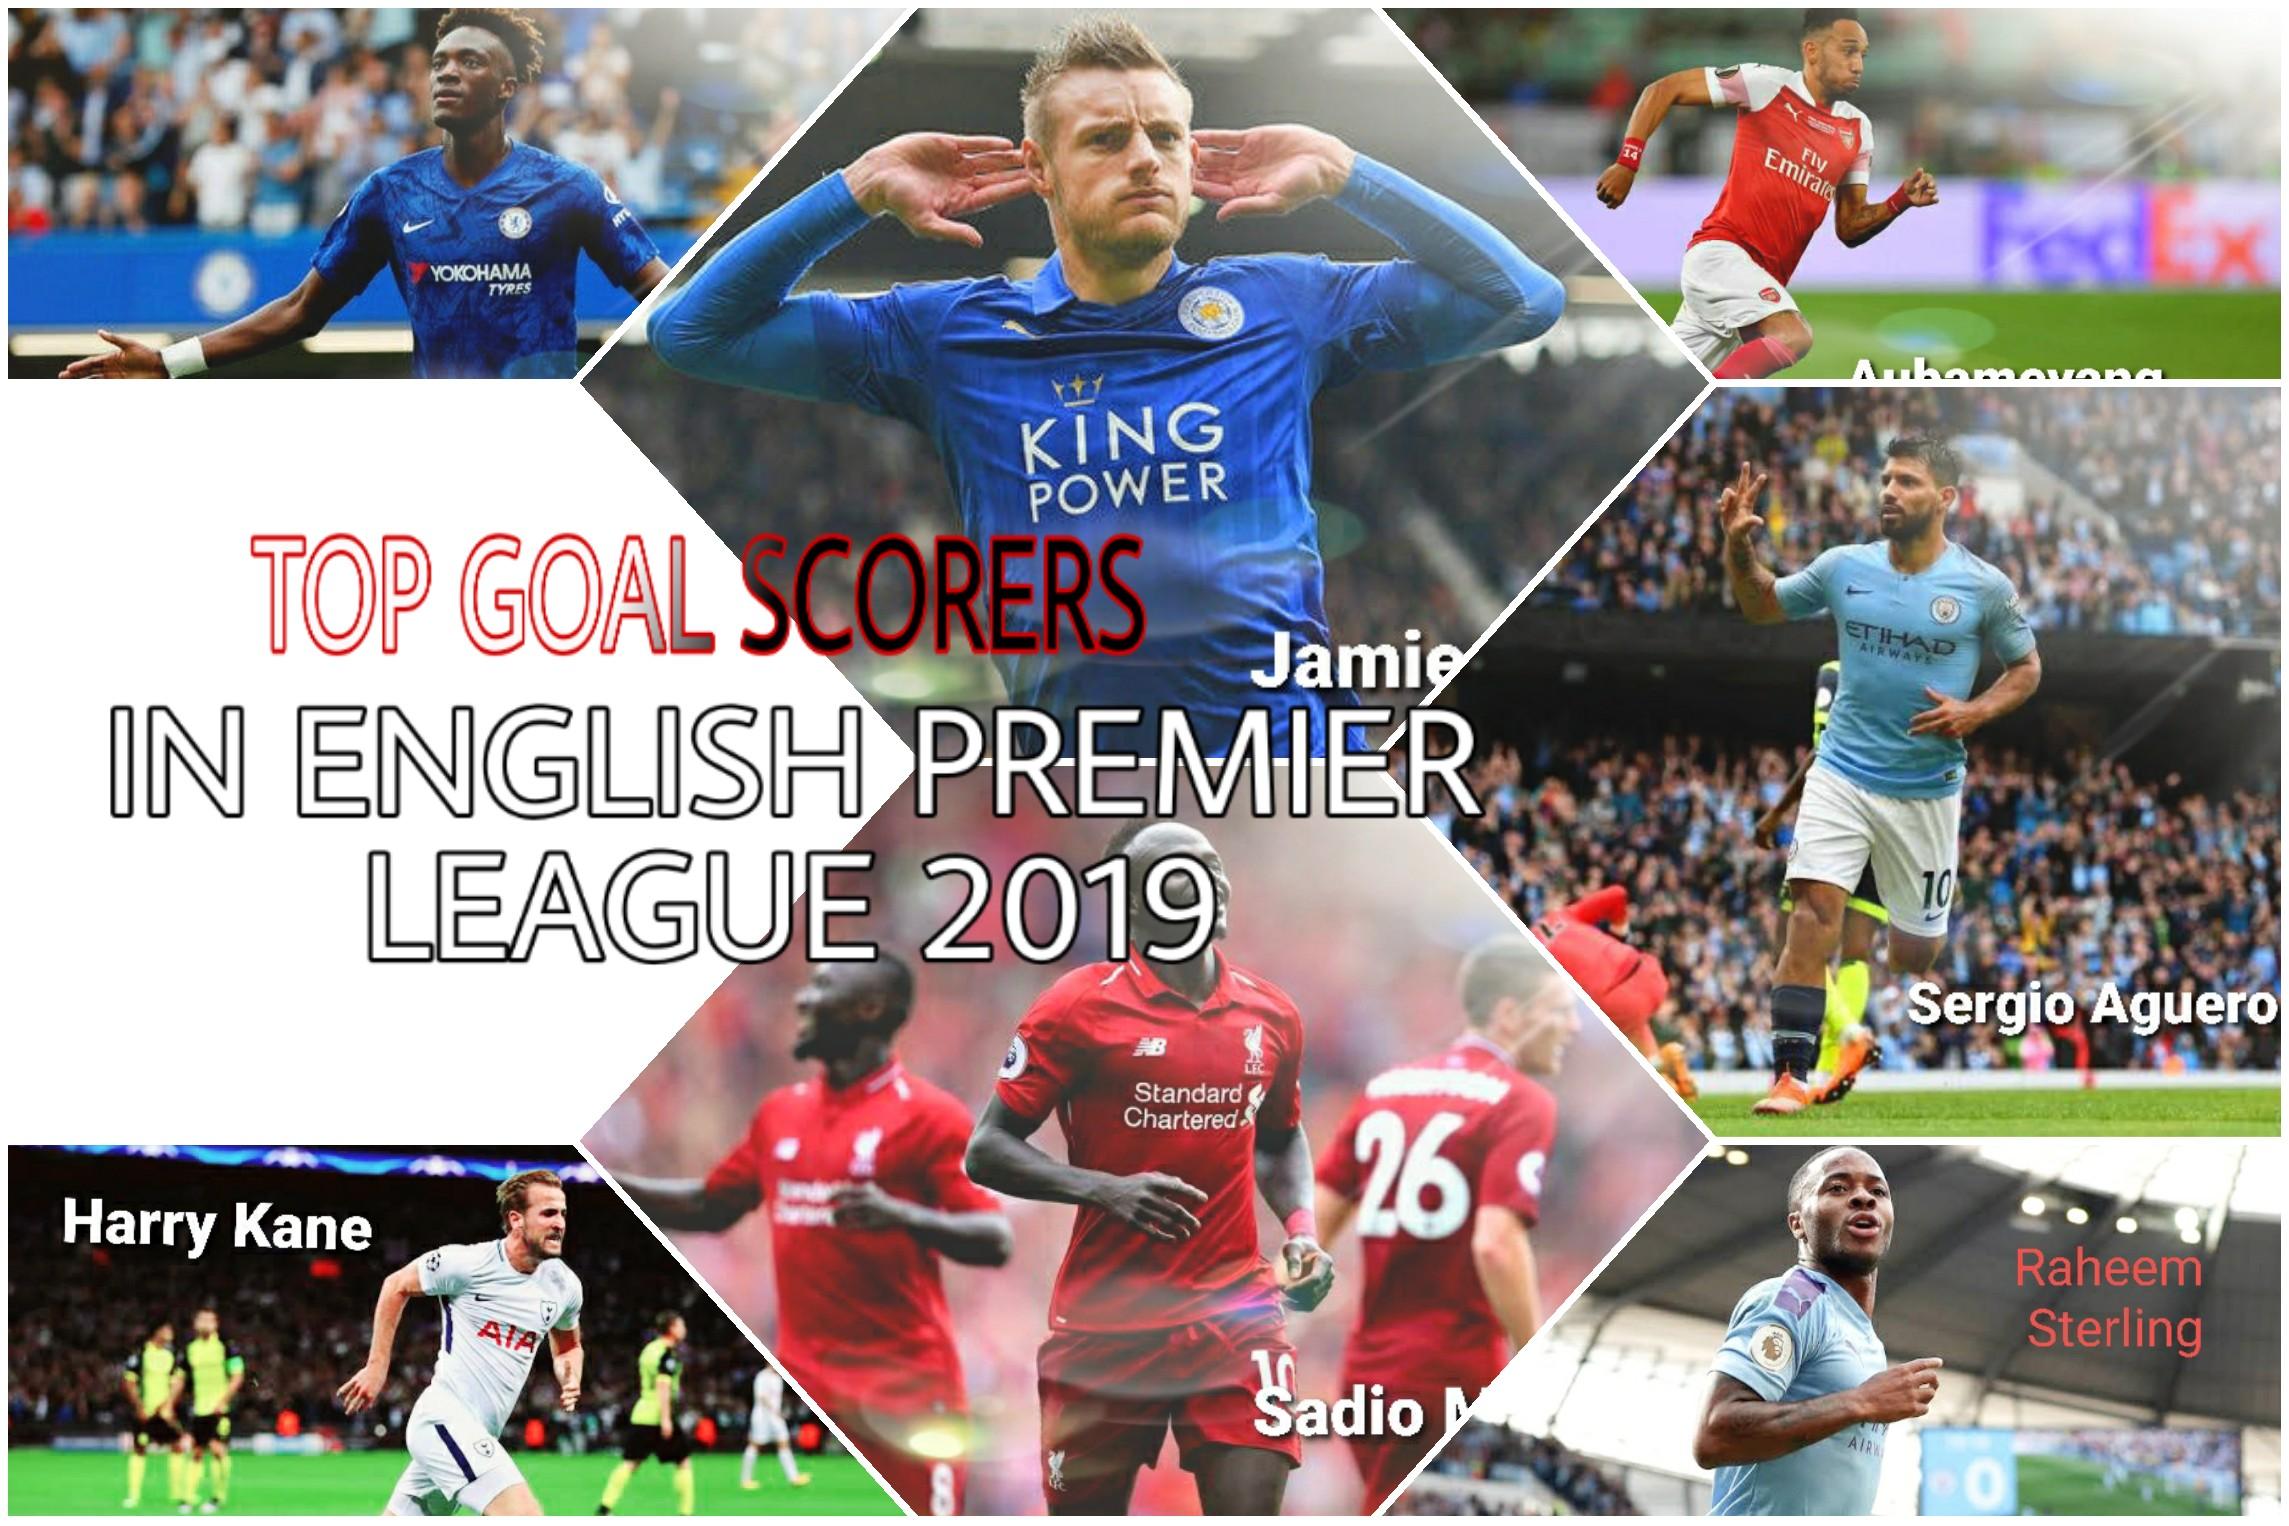 Top Goal Scorer in English Premier League 2019